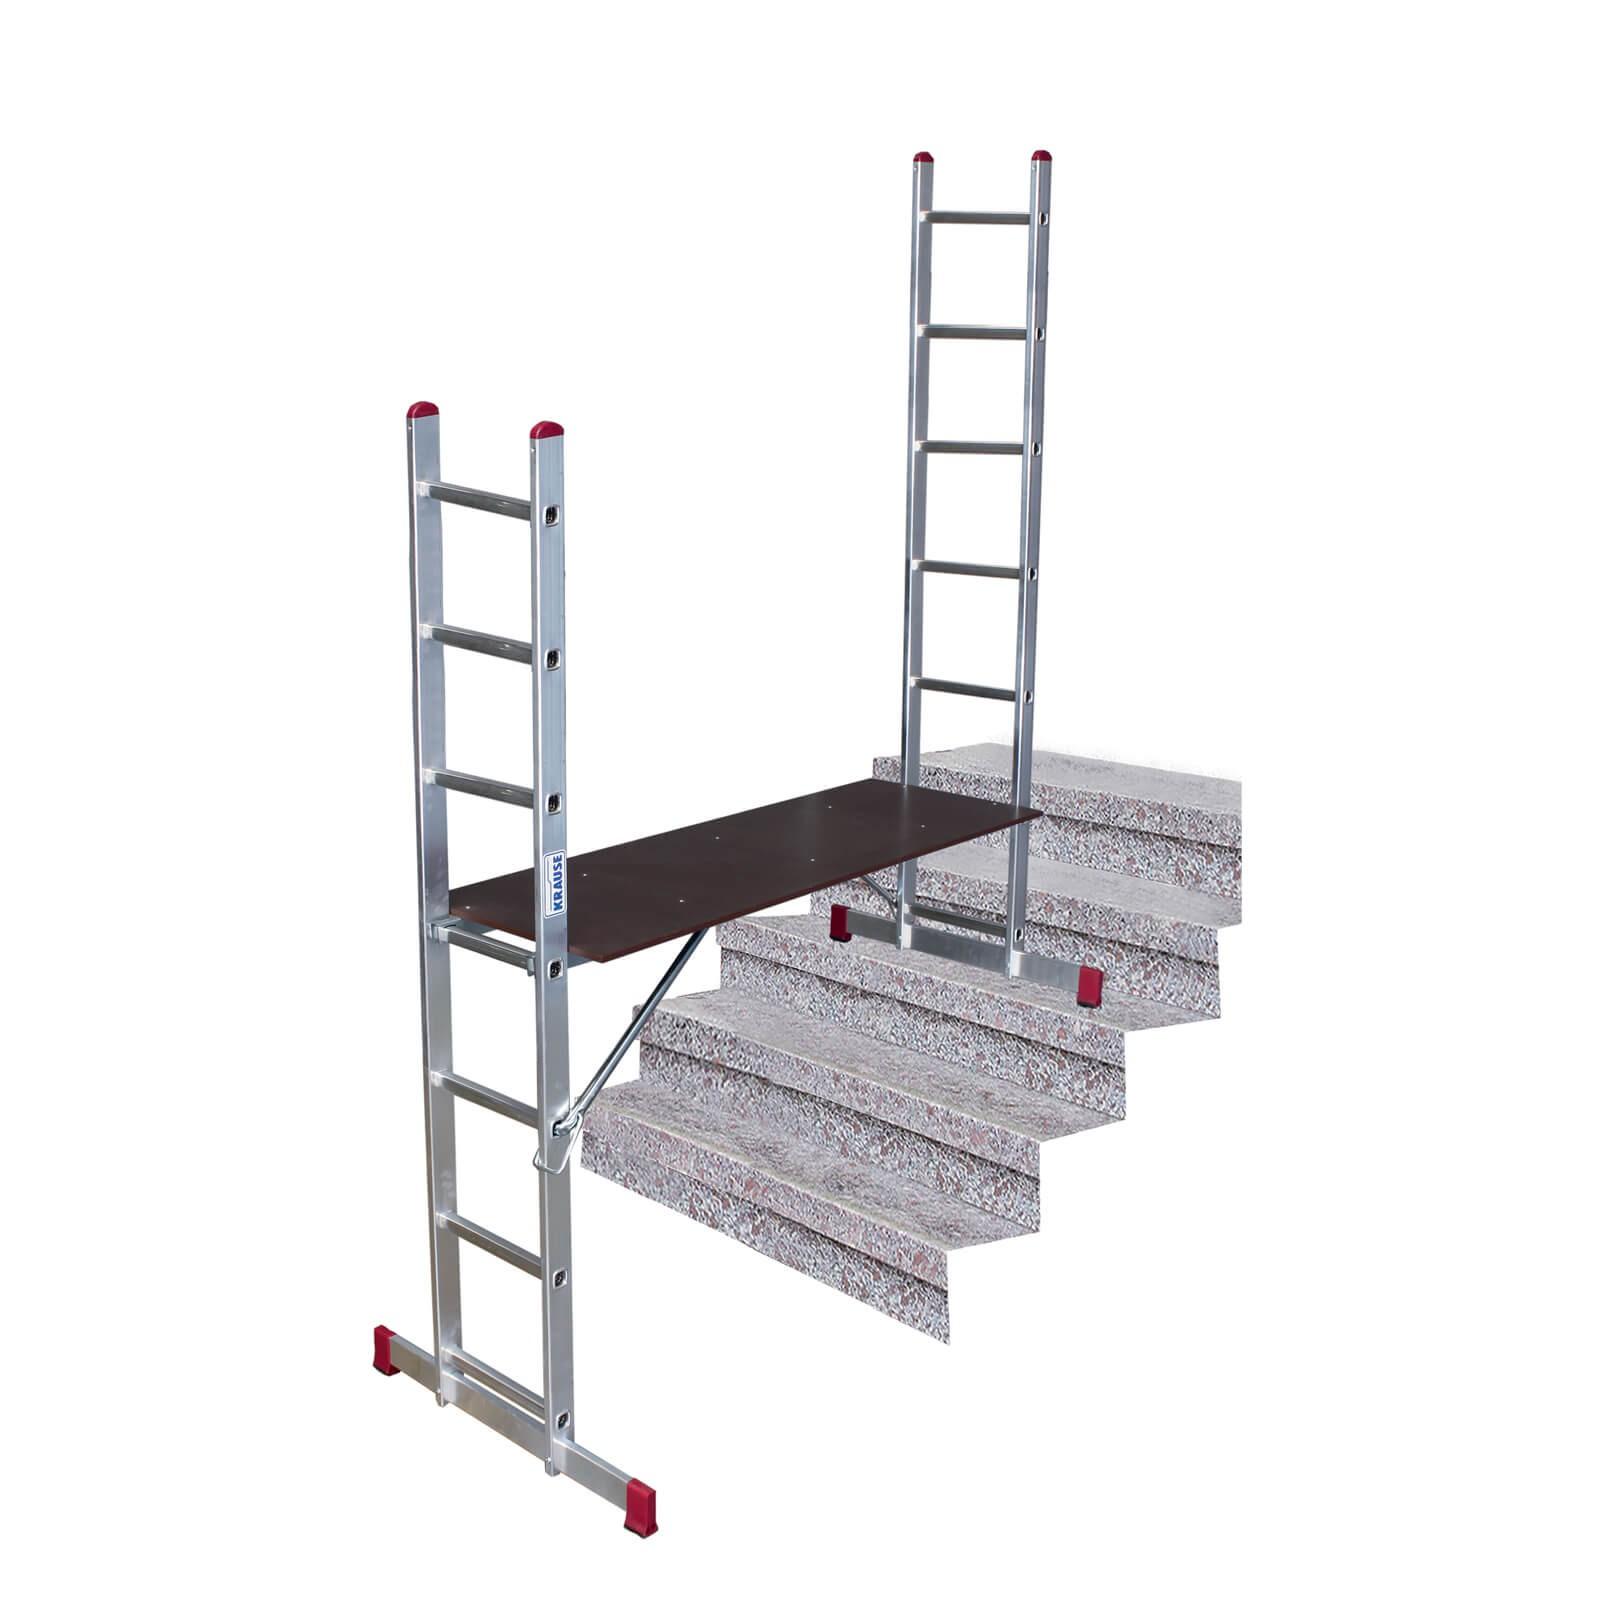 krause corda leiterger st multifunktions leiter ger st stehleiter 2x7 sprossen ebay. Black Bedroom Furniture Sets. Home Design Ideas